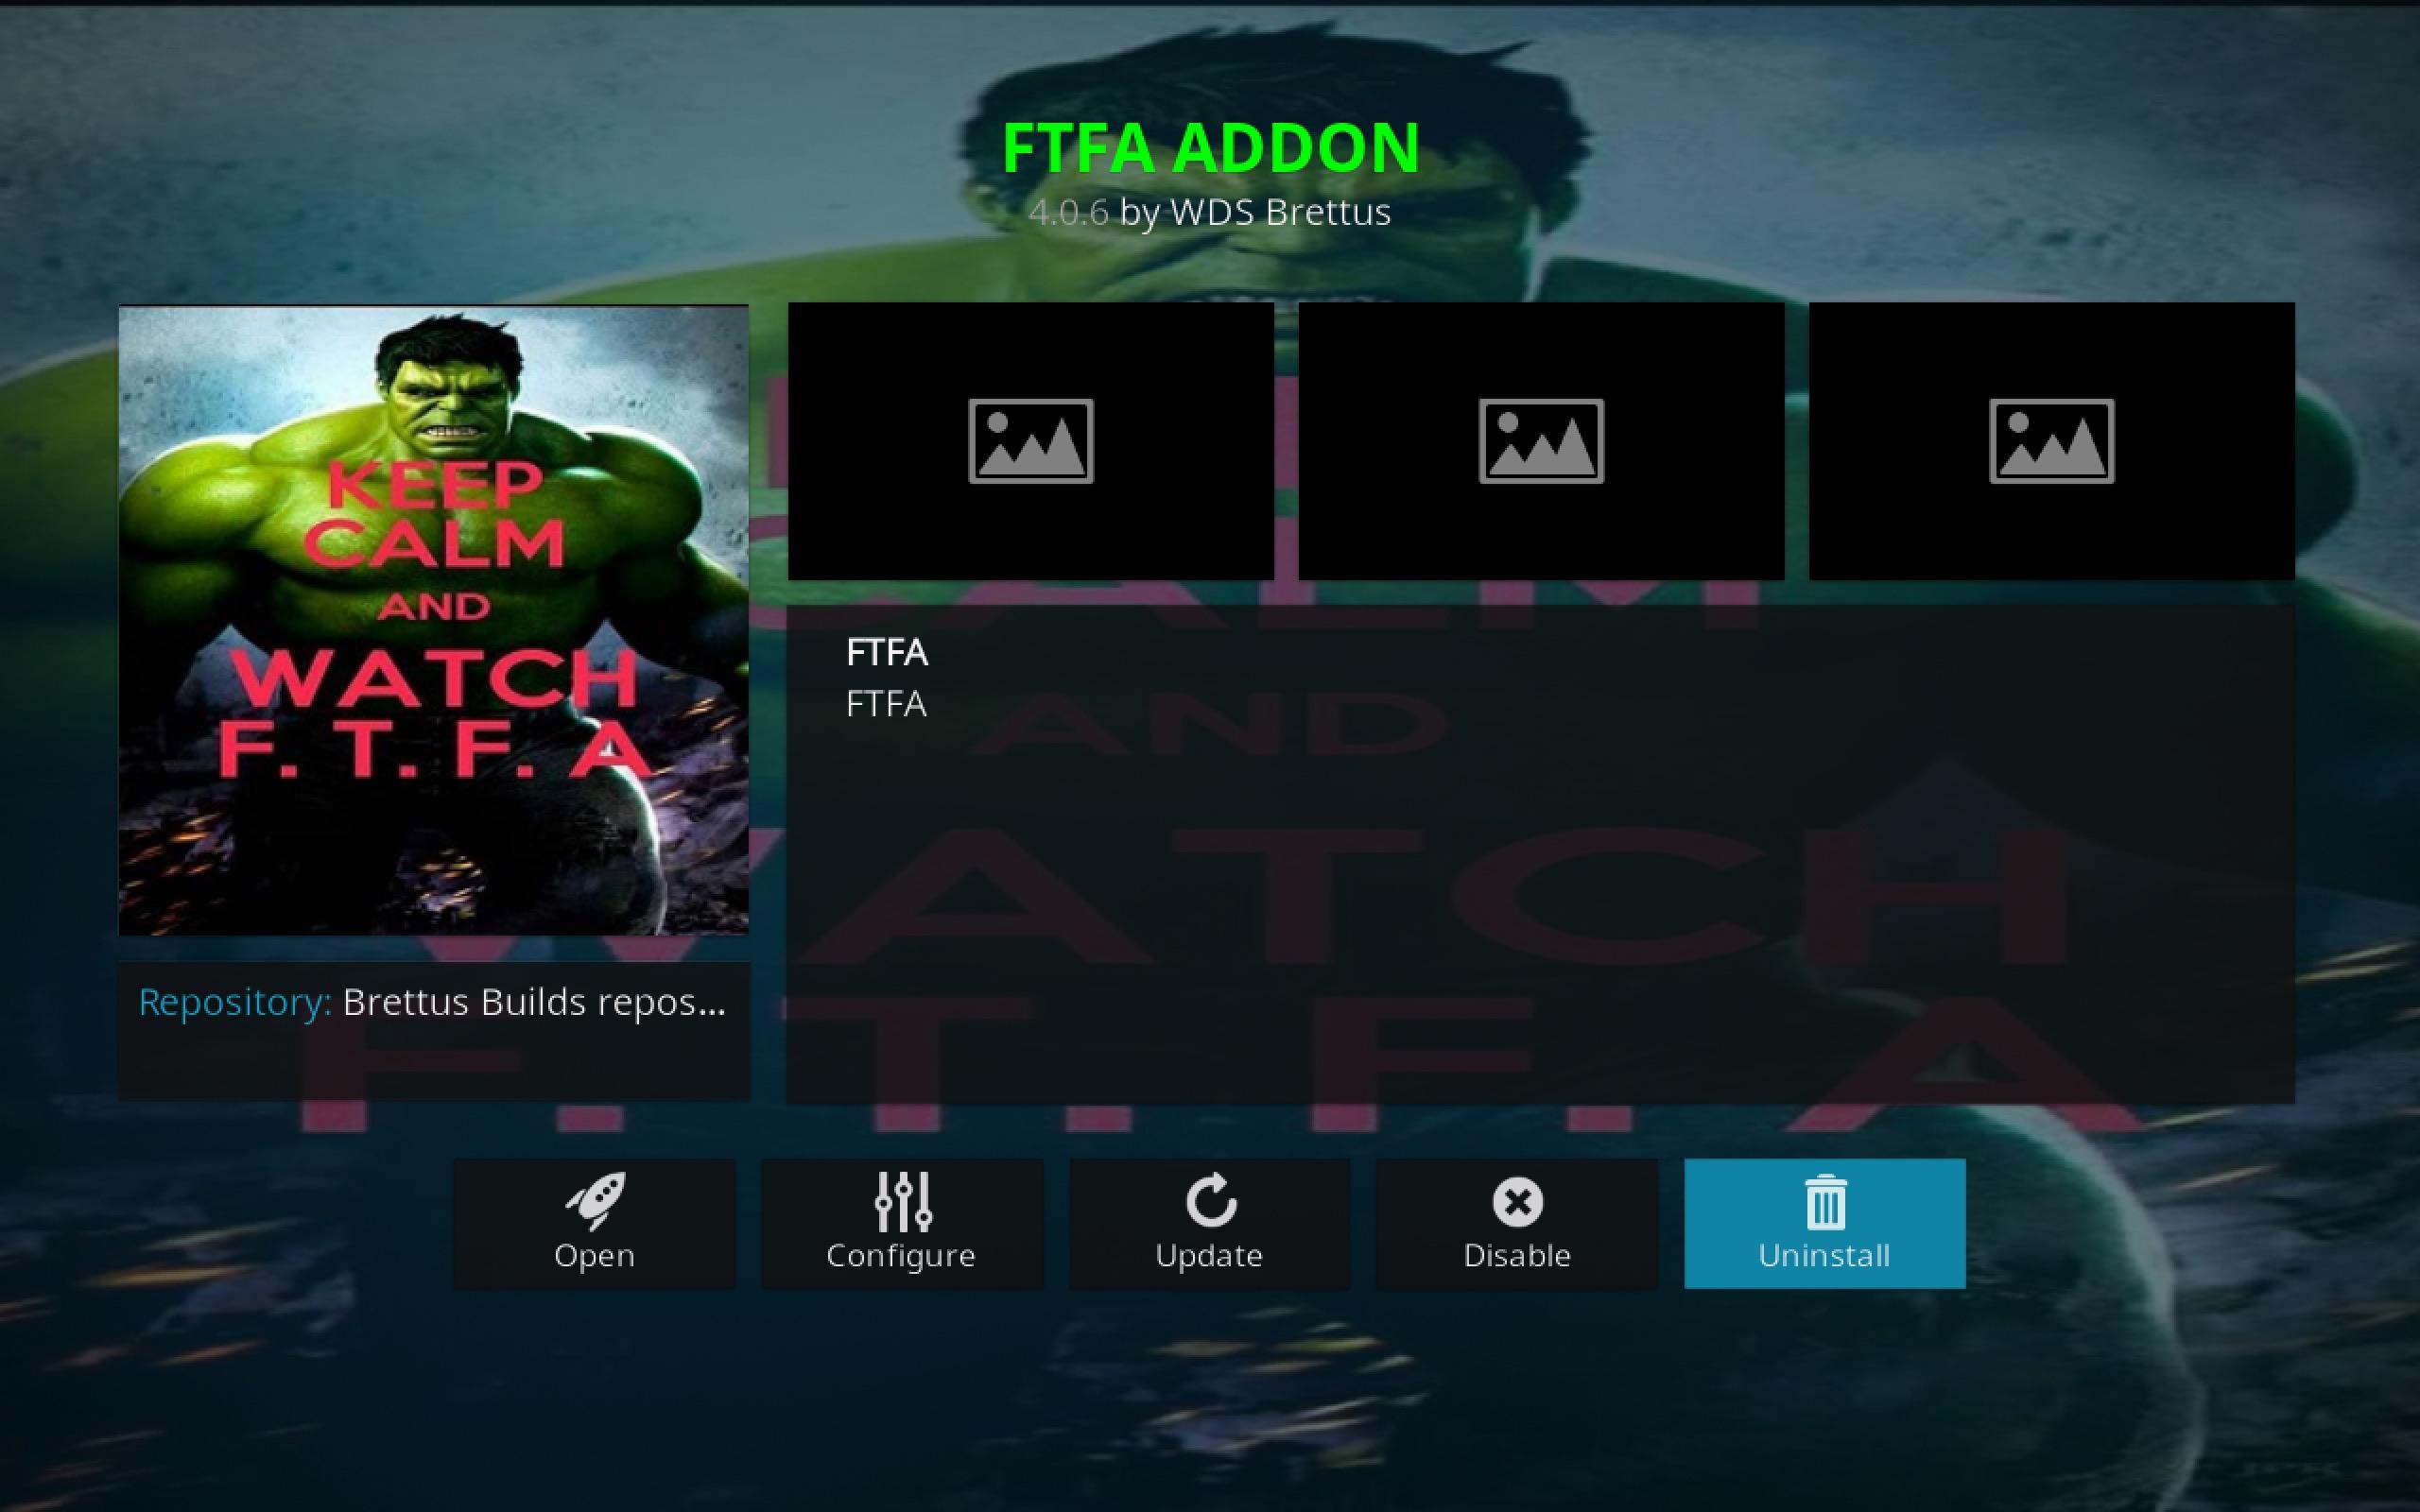 FTFA Add-on info